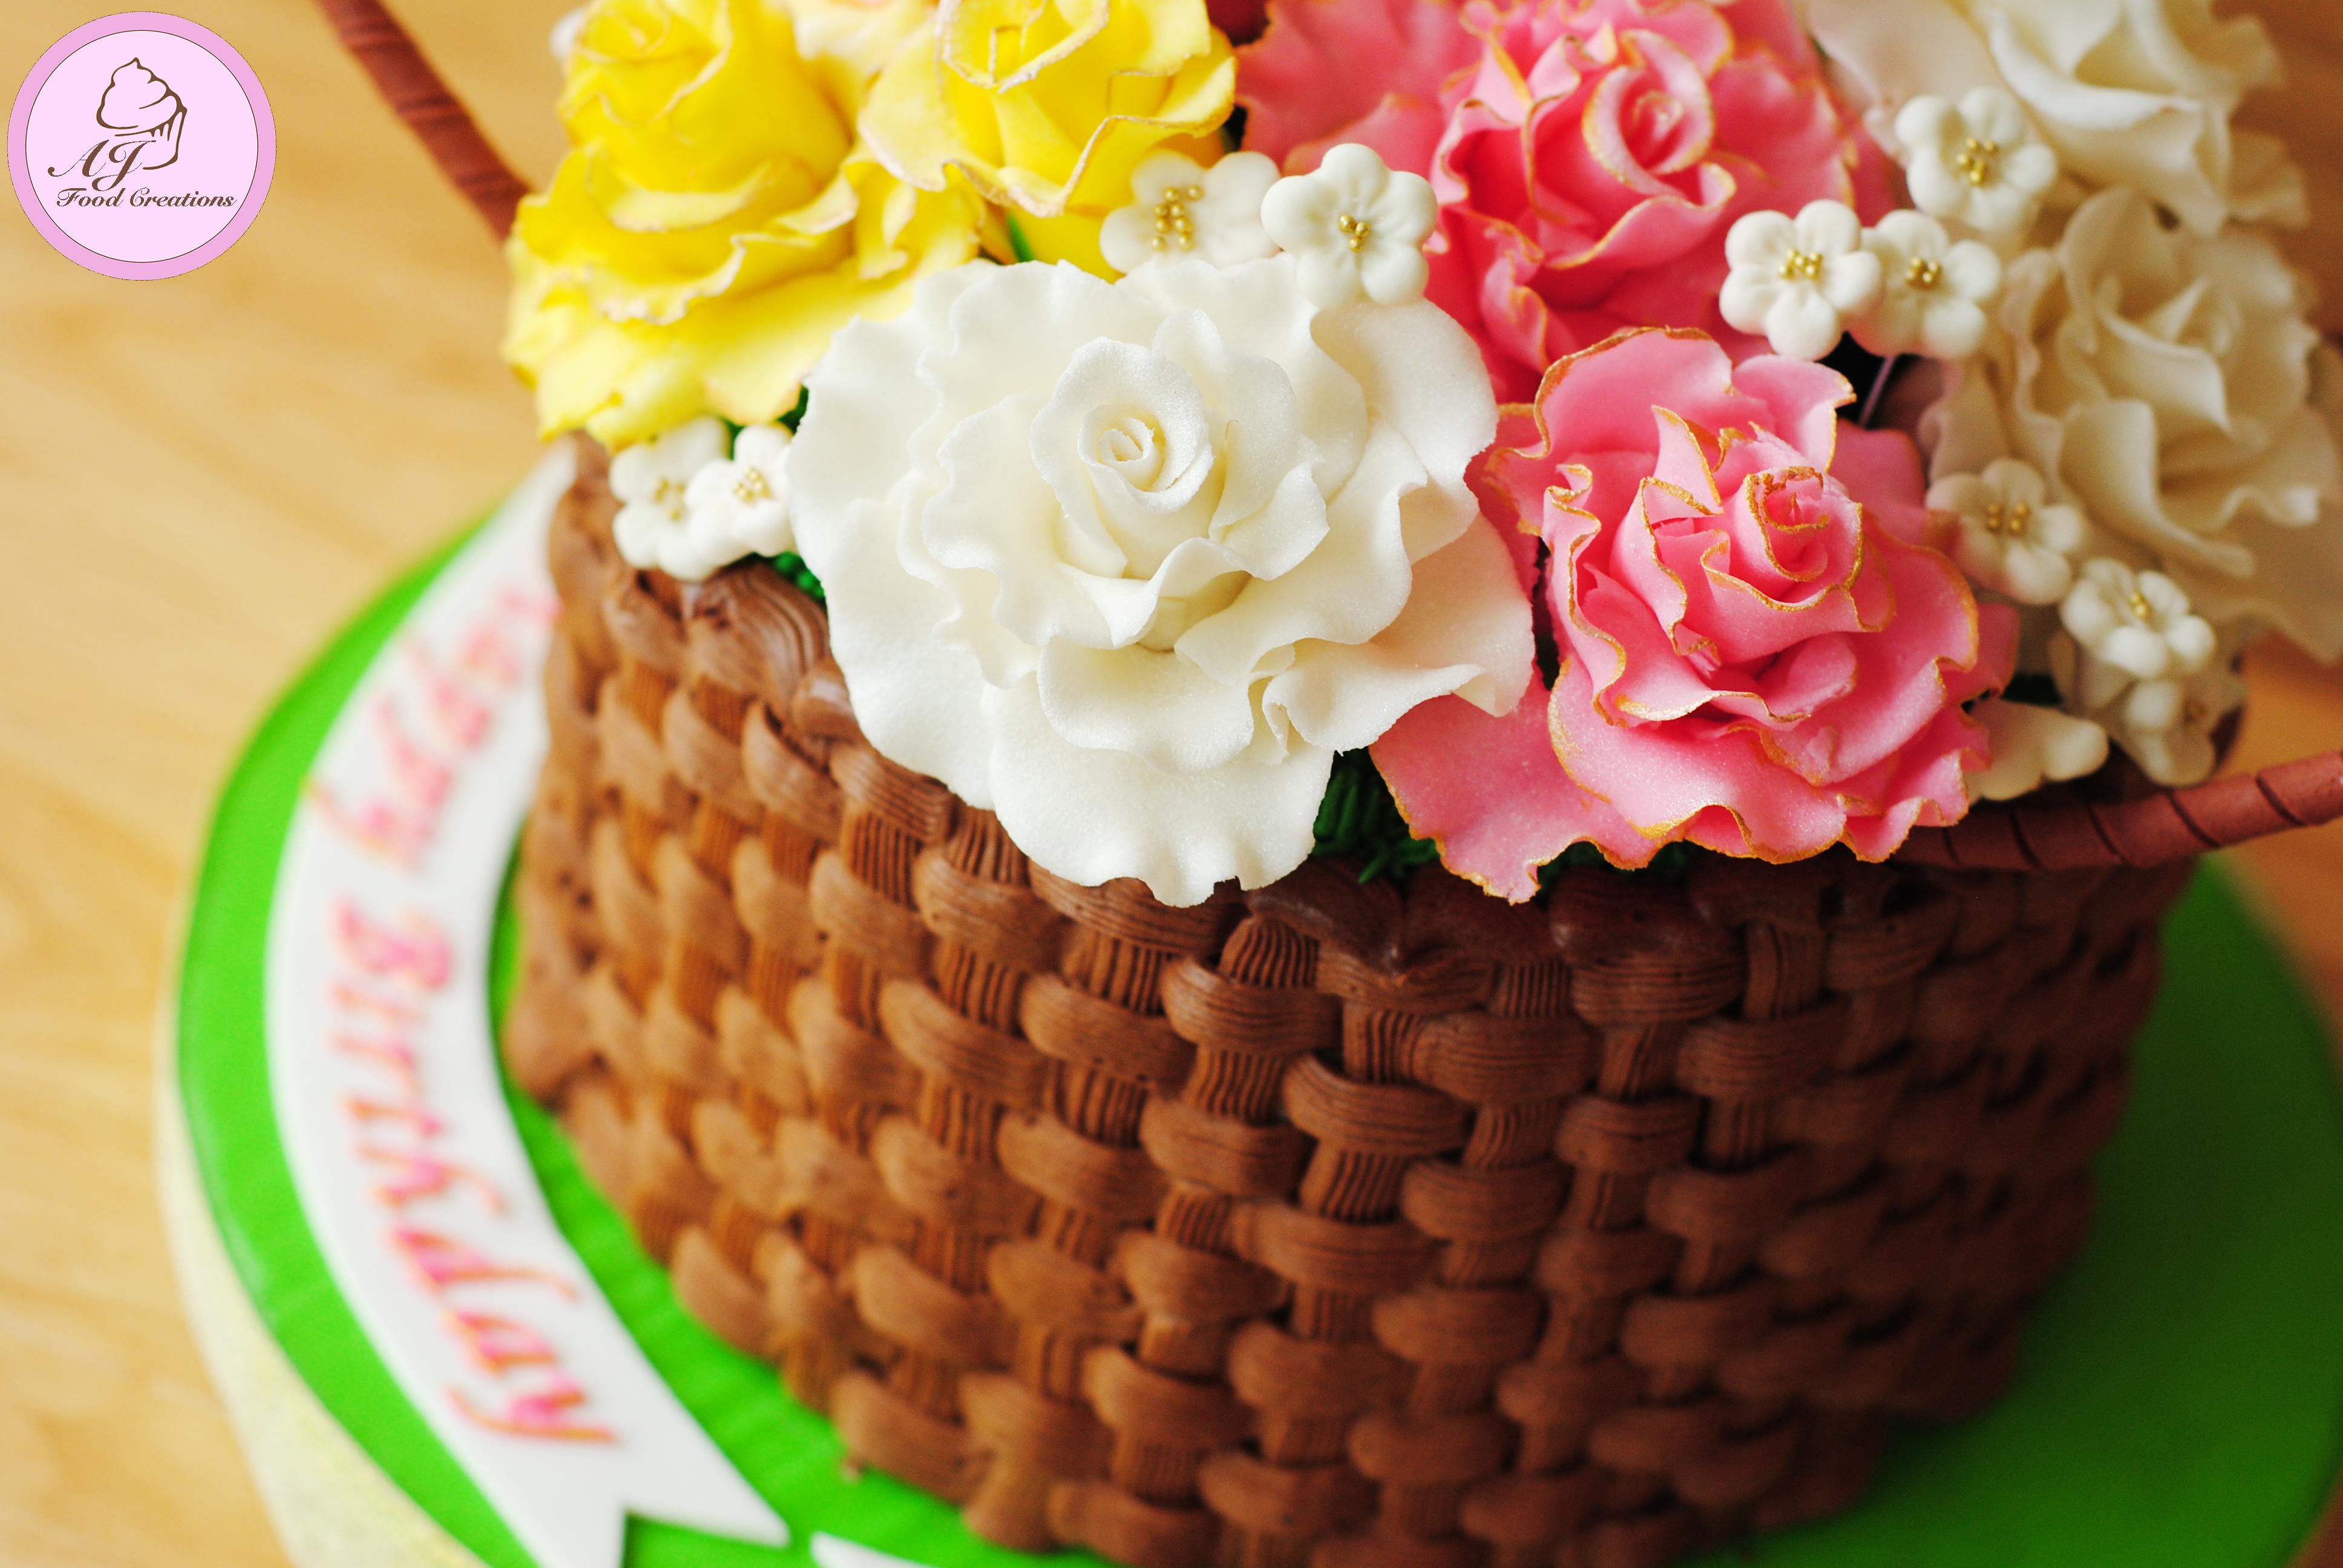 Basket Of Flowers Cake Lola Cedes 88th Birthday Aj Food Creations